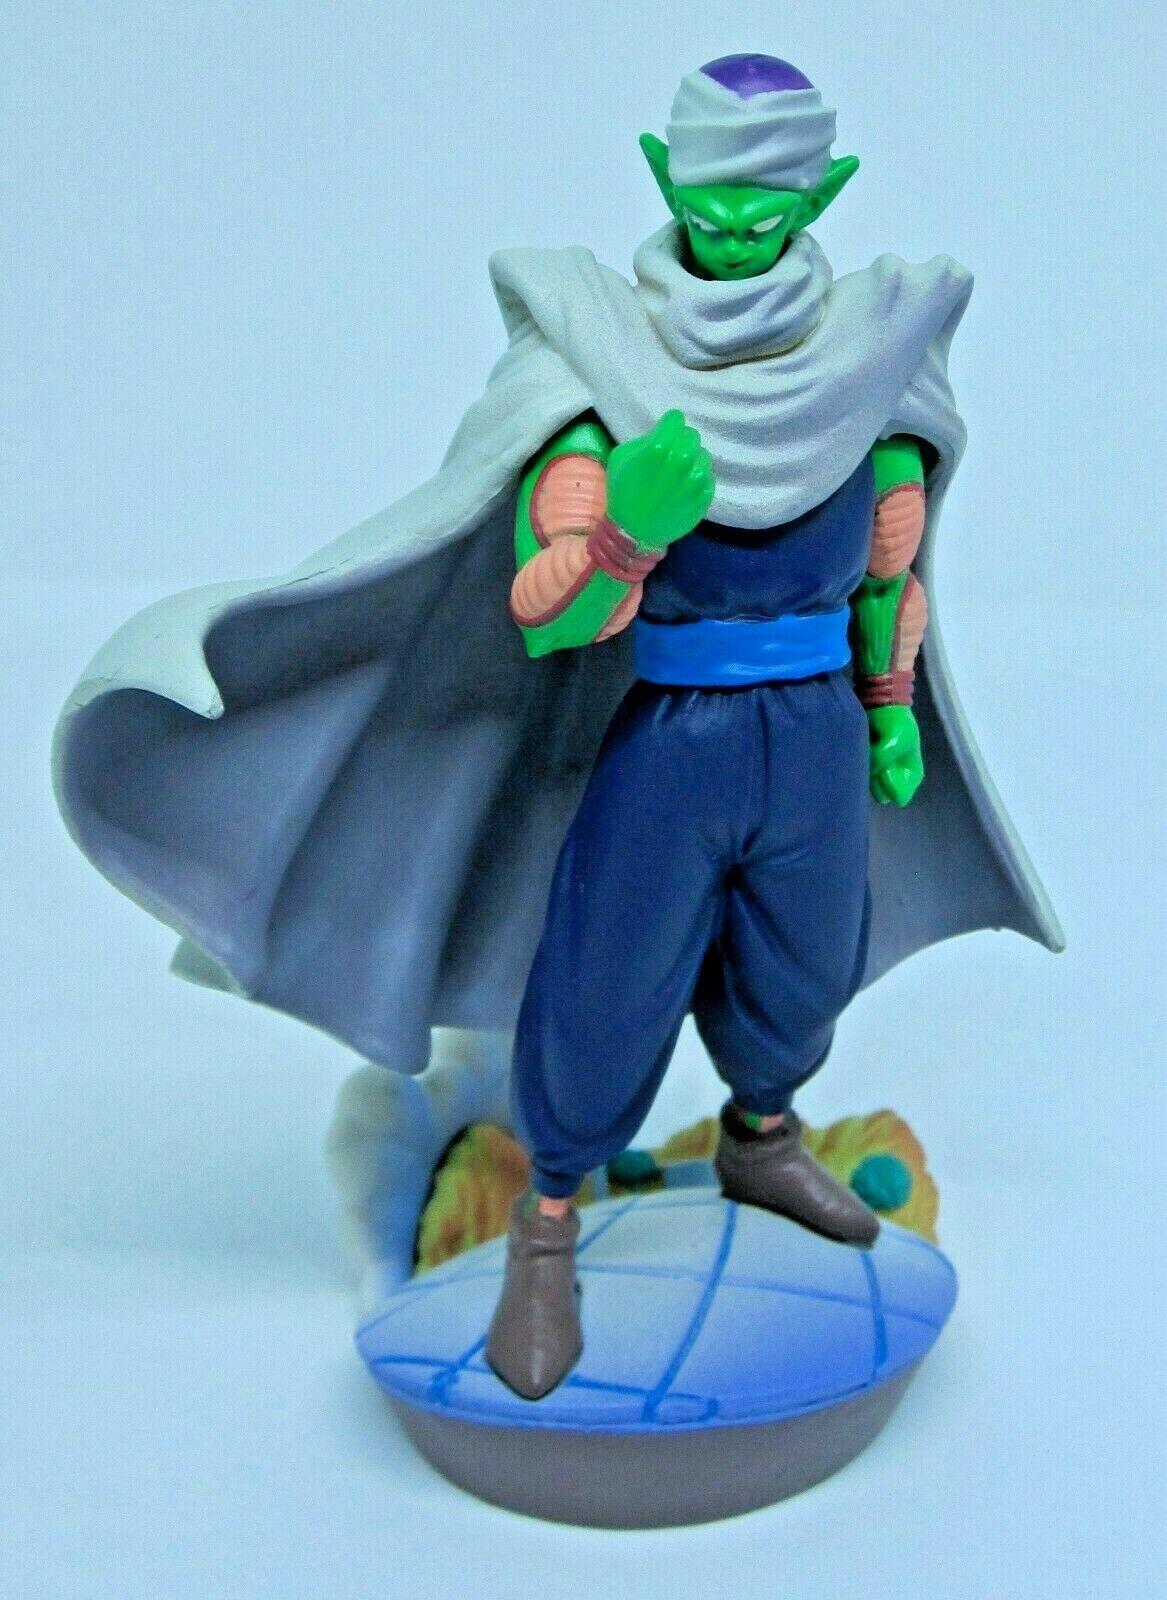 Dragon Ball Z Gashapon CAPSULE Piccolo Ma Junior by MEGAHOUSE